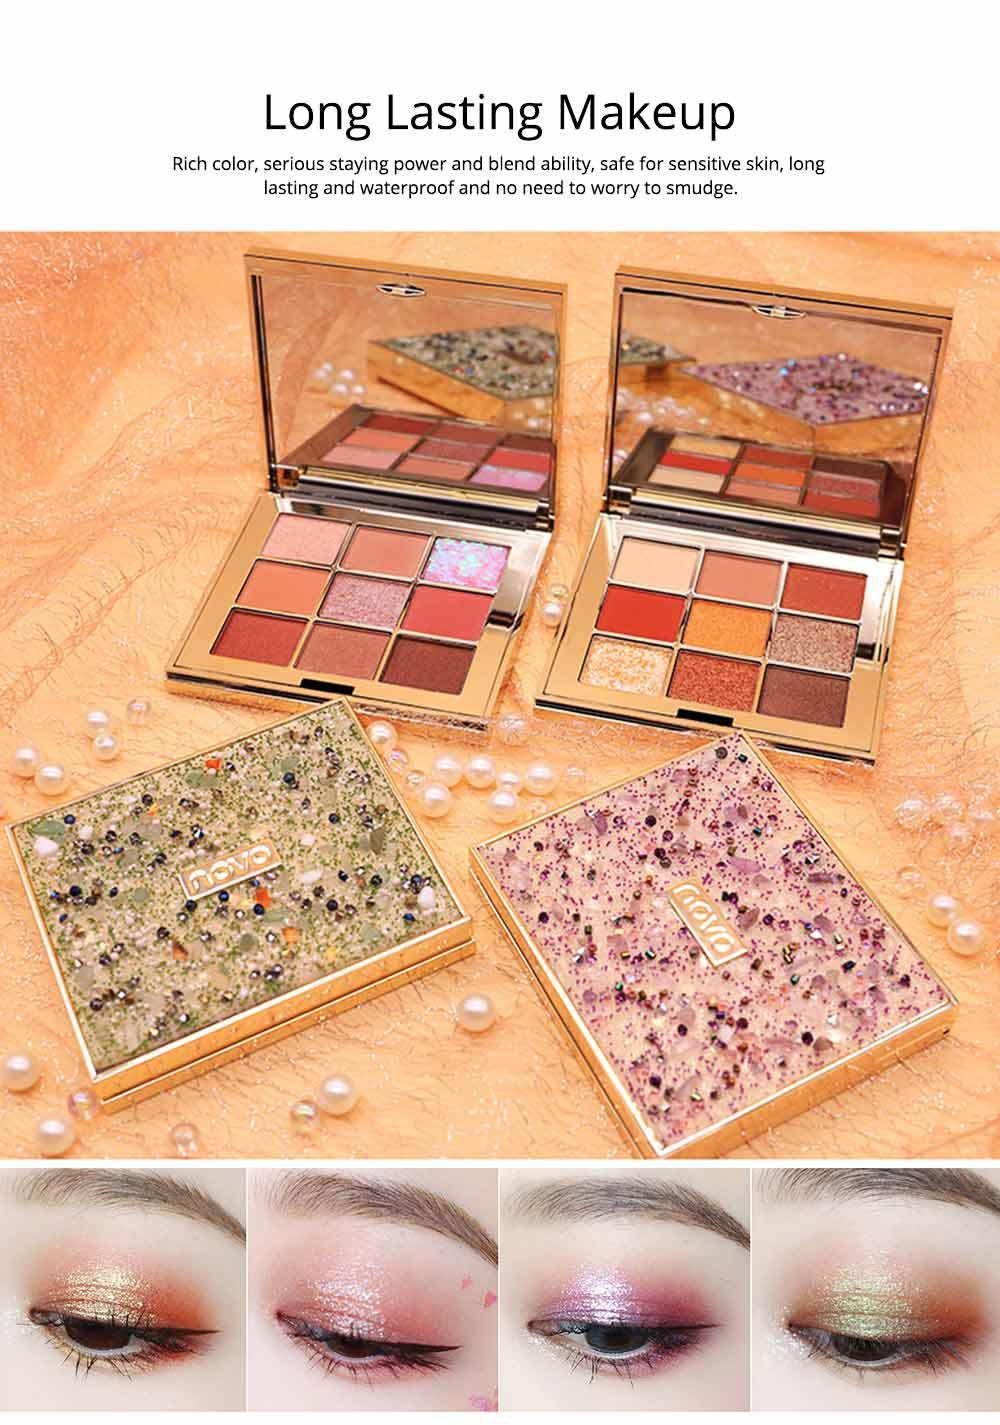 9 Colors Eyeshadow, Palette Glitter Velvet Texture Mixed Eye Makeup, Long Lasting Eye Shadow Tray Best Gift for Women 1